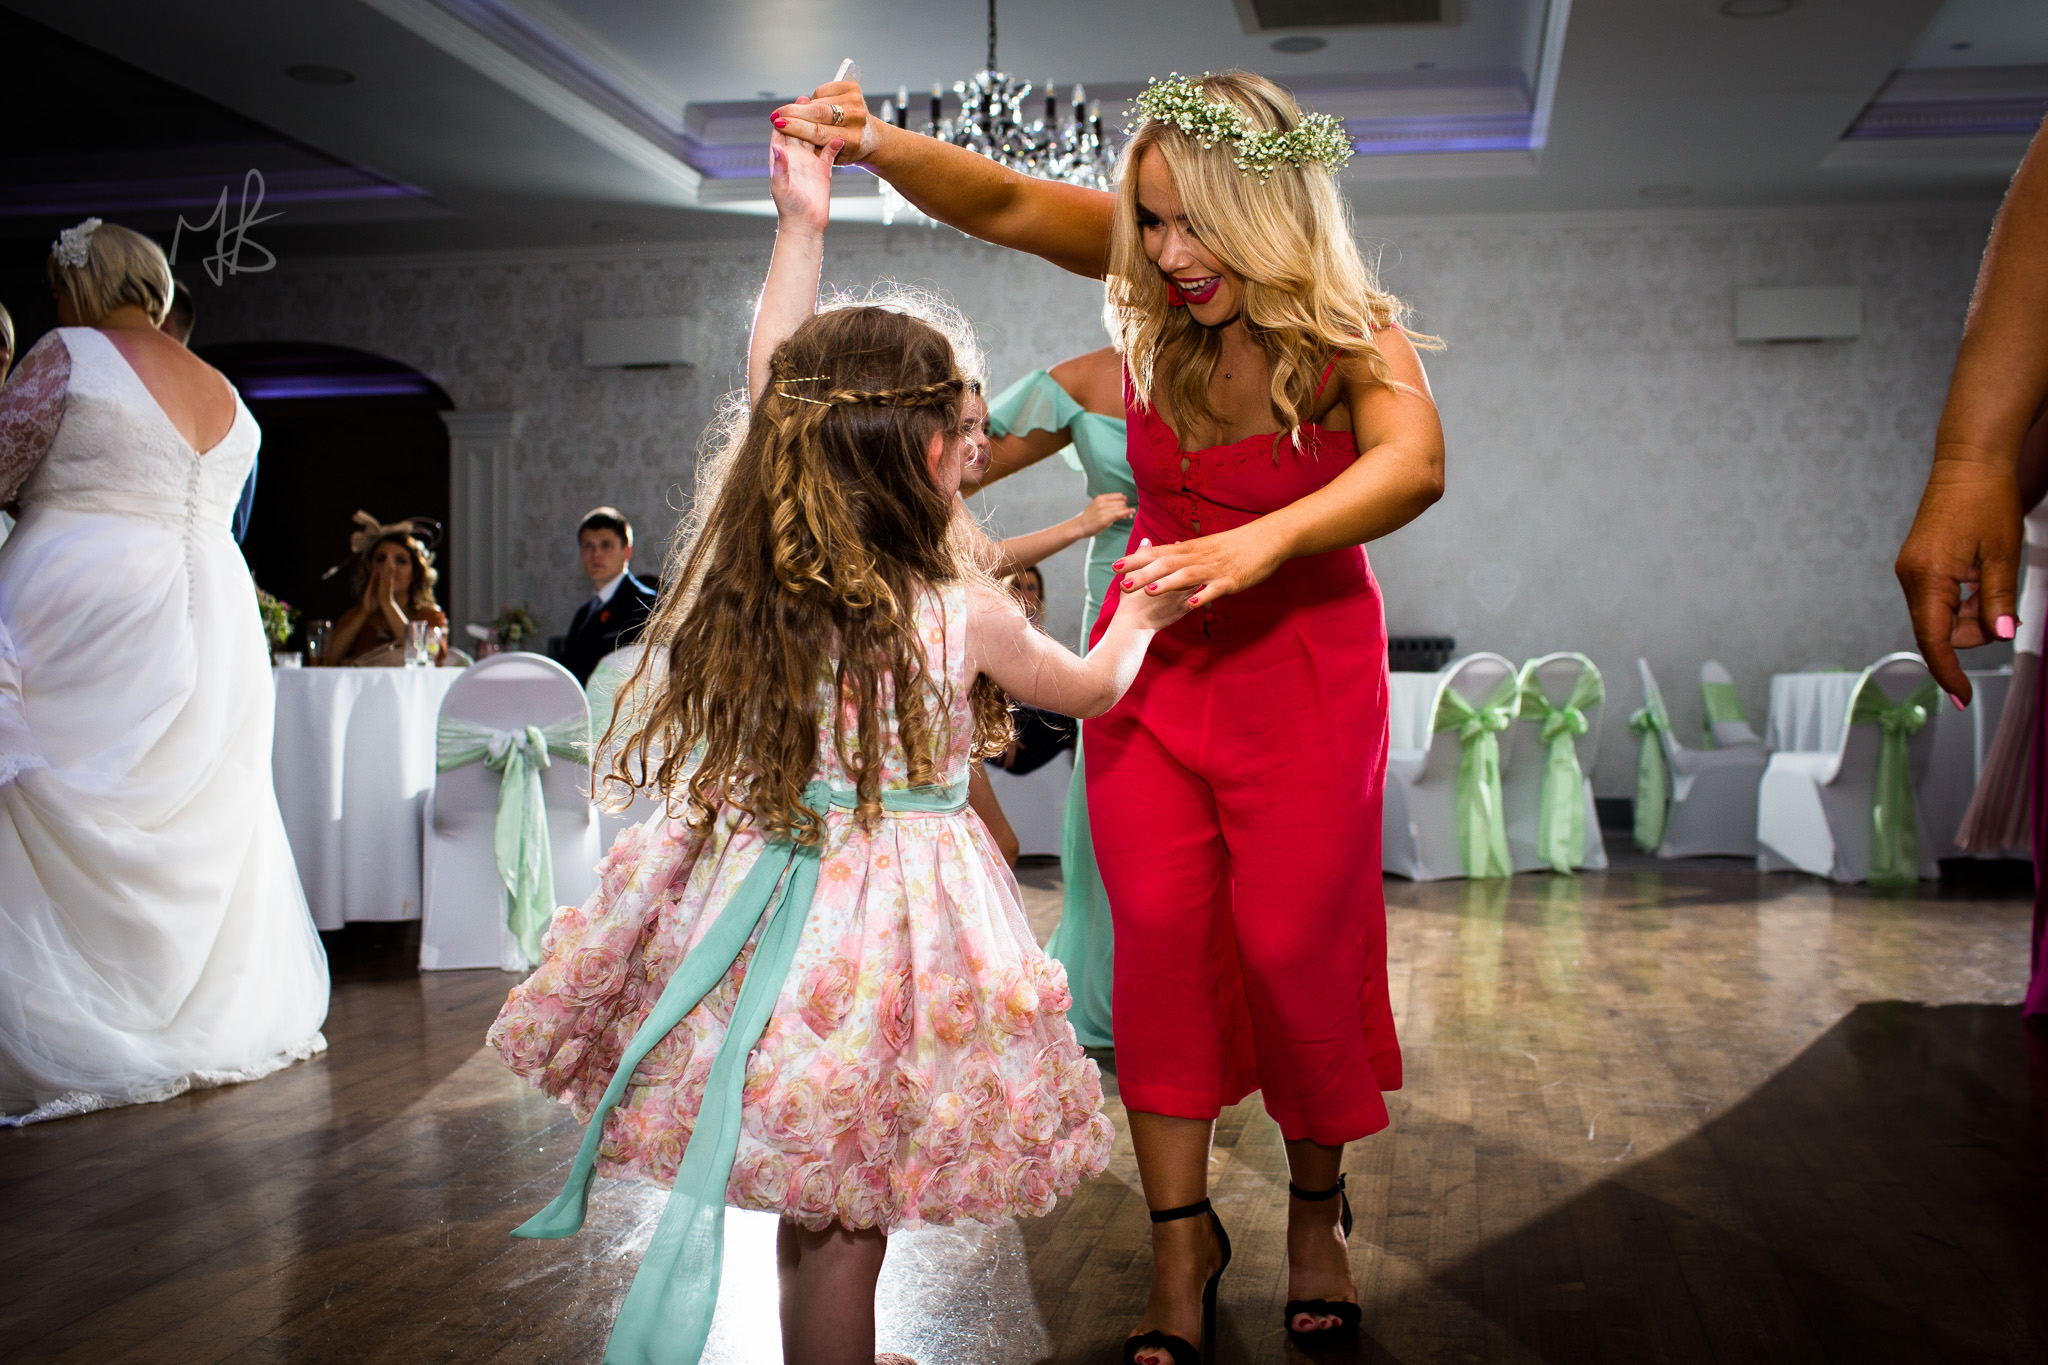 Northern-Ireland-Wedding-Photographer-Mark-Barnes-Ballymena_wedding-photography-Leighinmohr-House-Seamas_Alanna_For-web-66.jpg